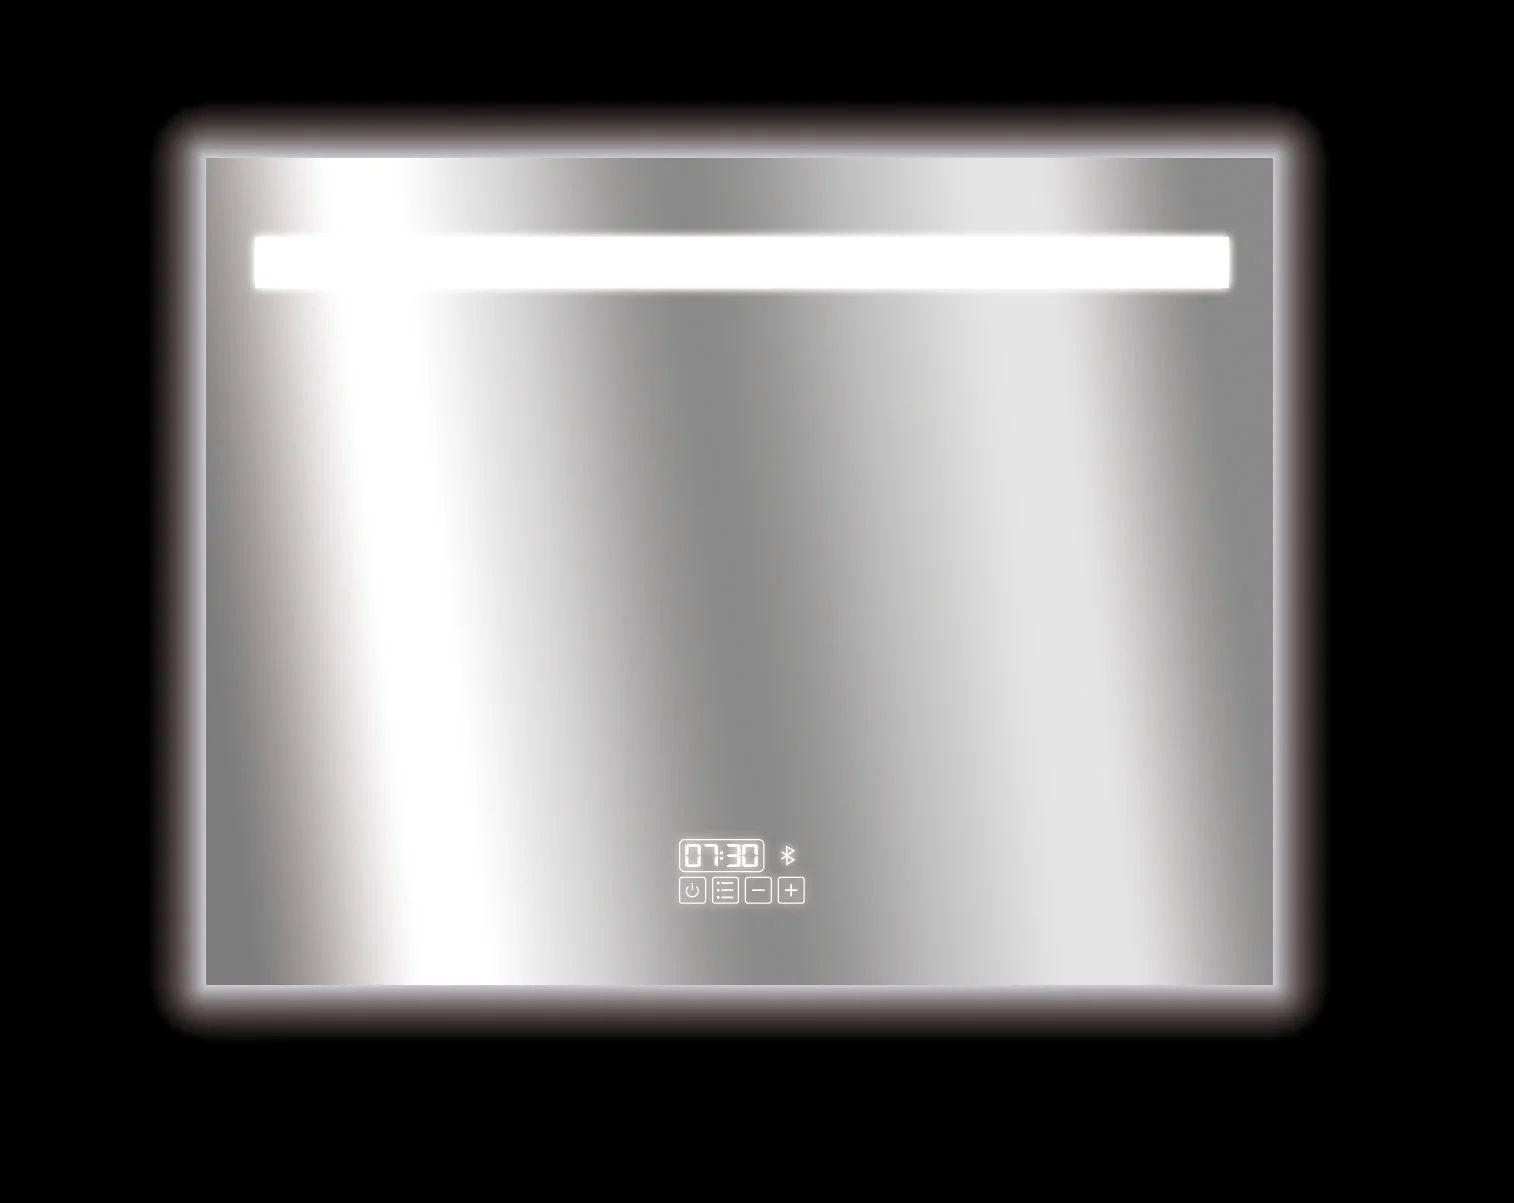 Miroir Lumineux Avec Eclairage Integre L 90 X H 70 Cm Bluetooth Leroy Merlin